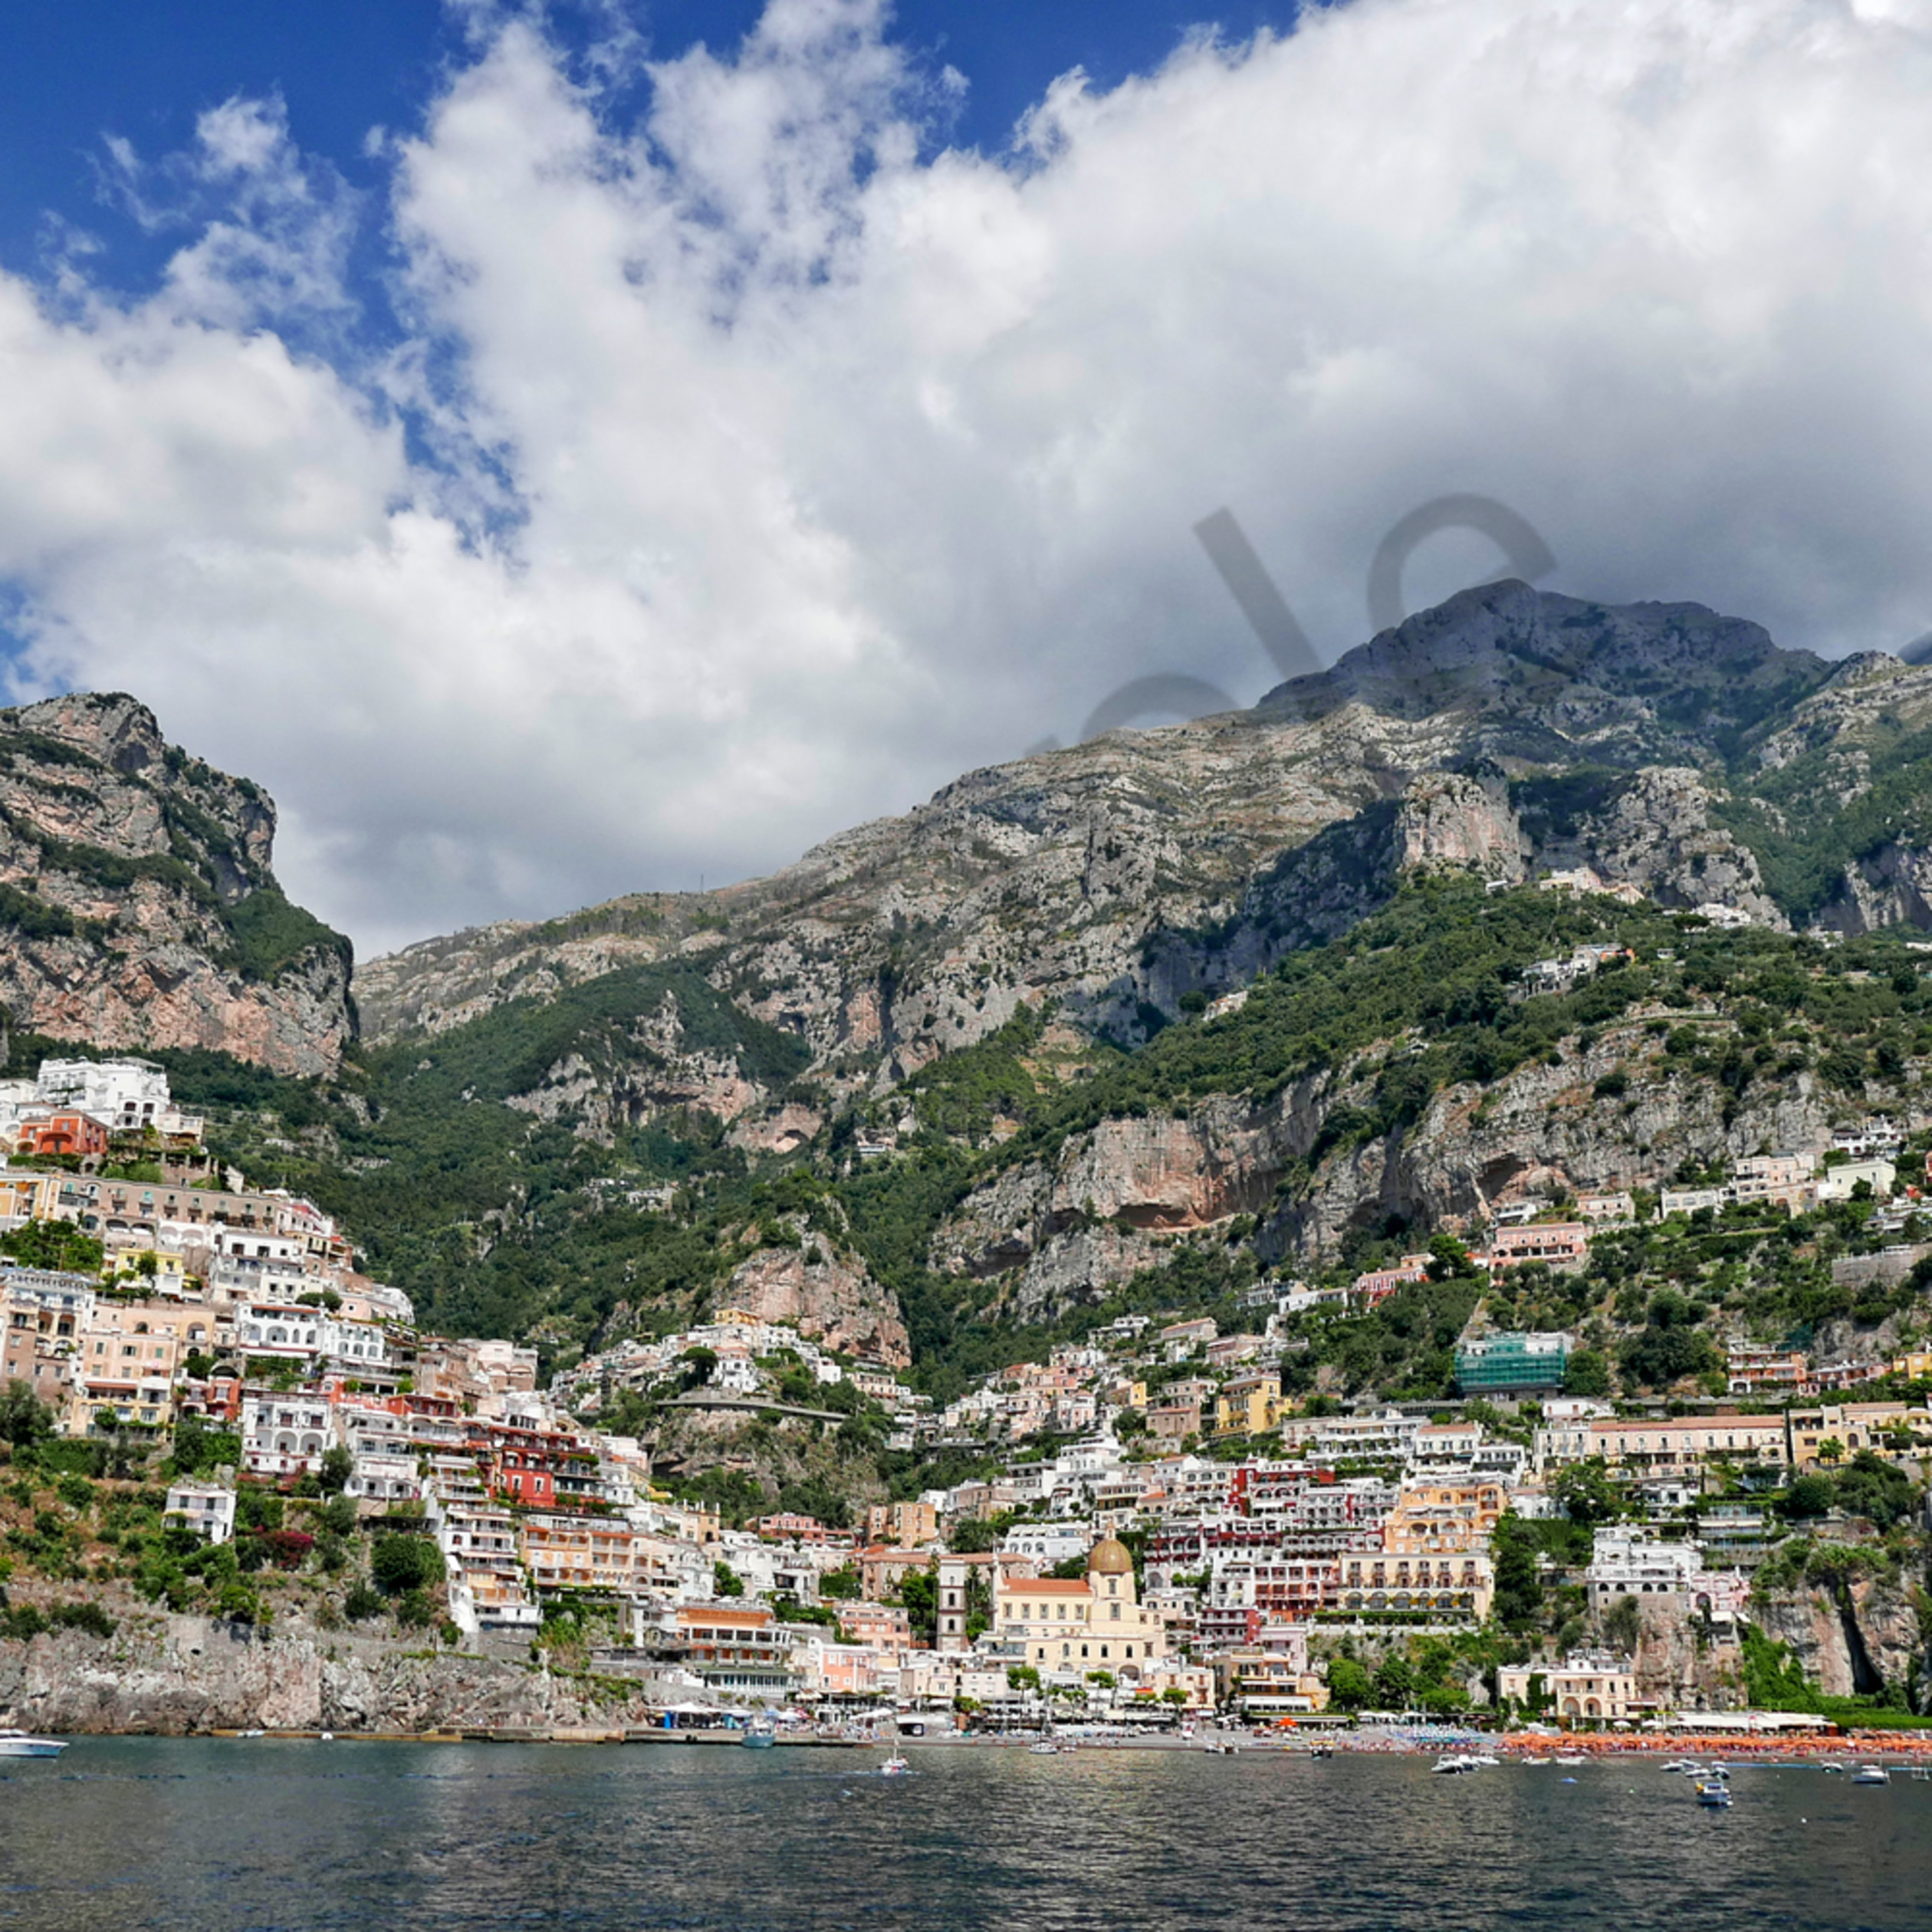 Positano amalfi coast1 1 of 1 sklold